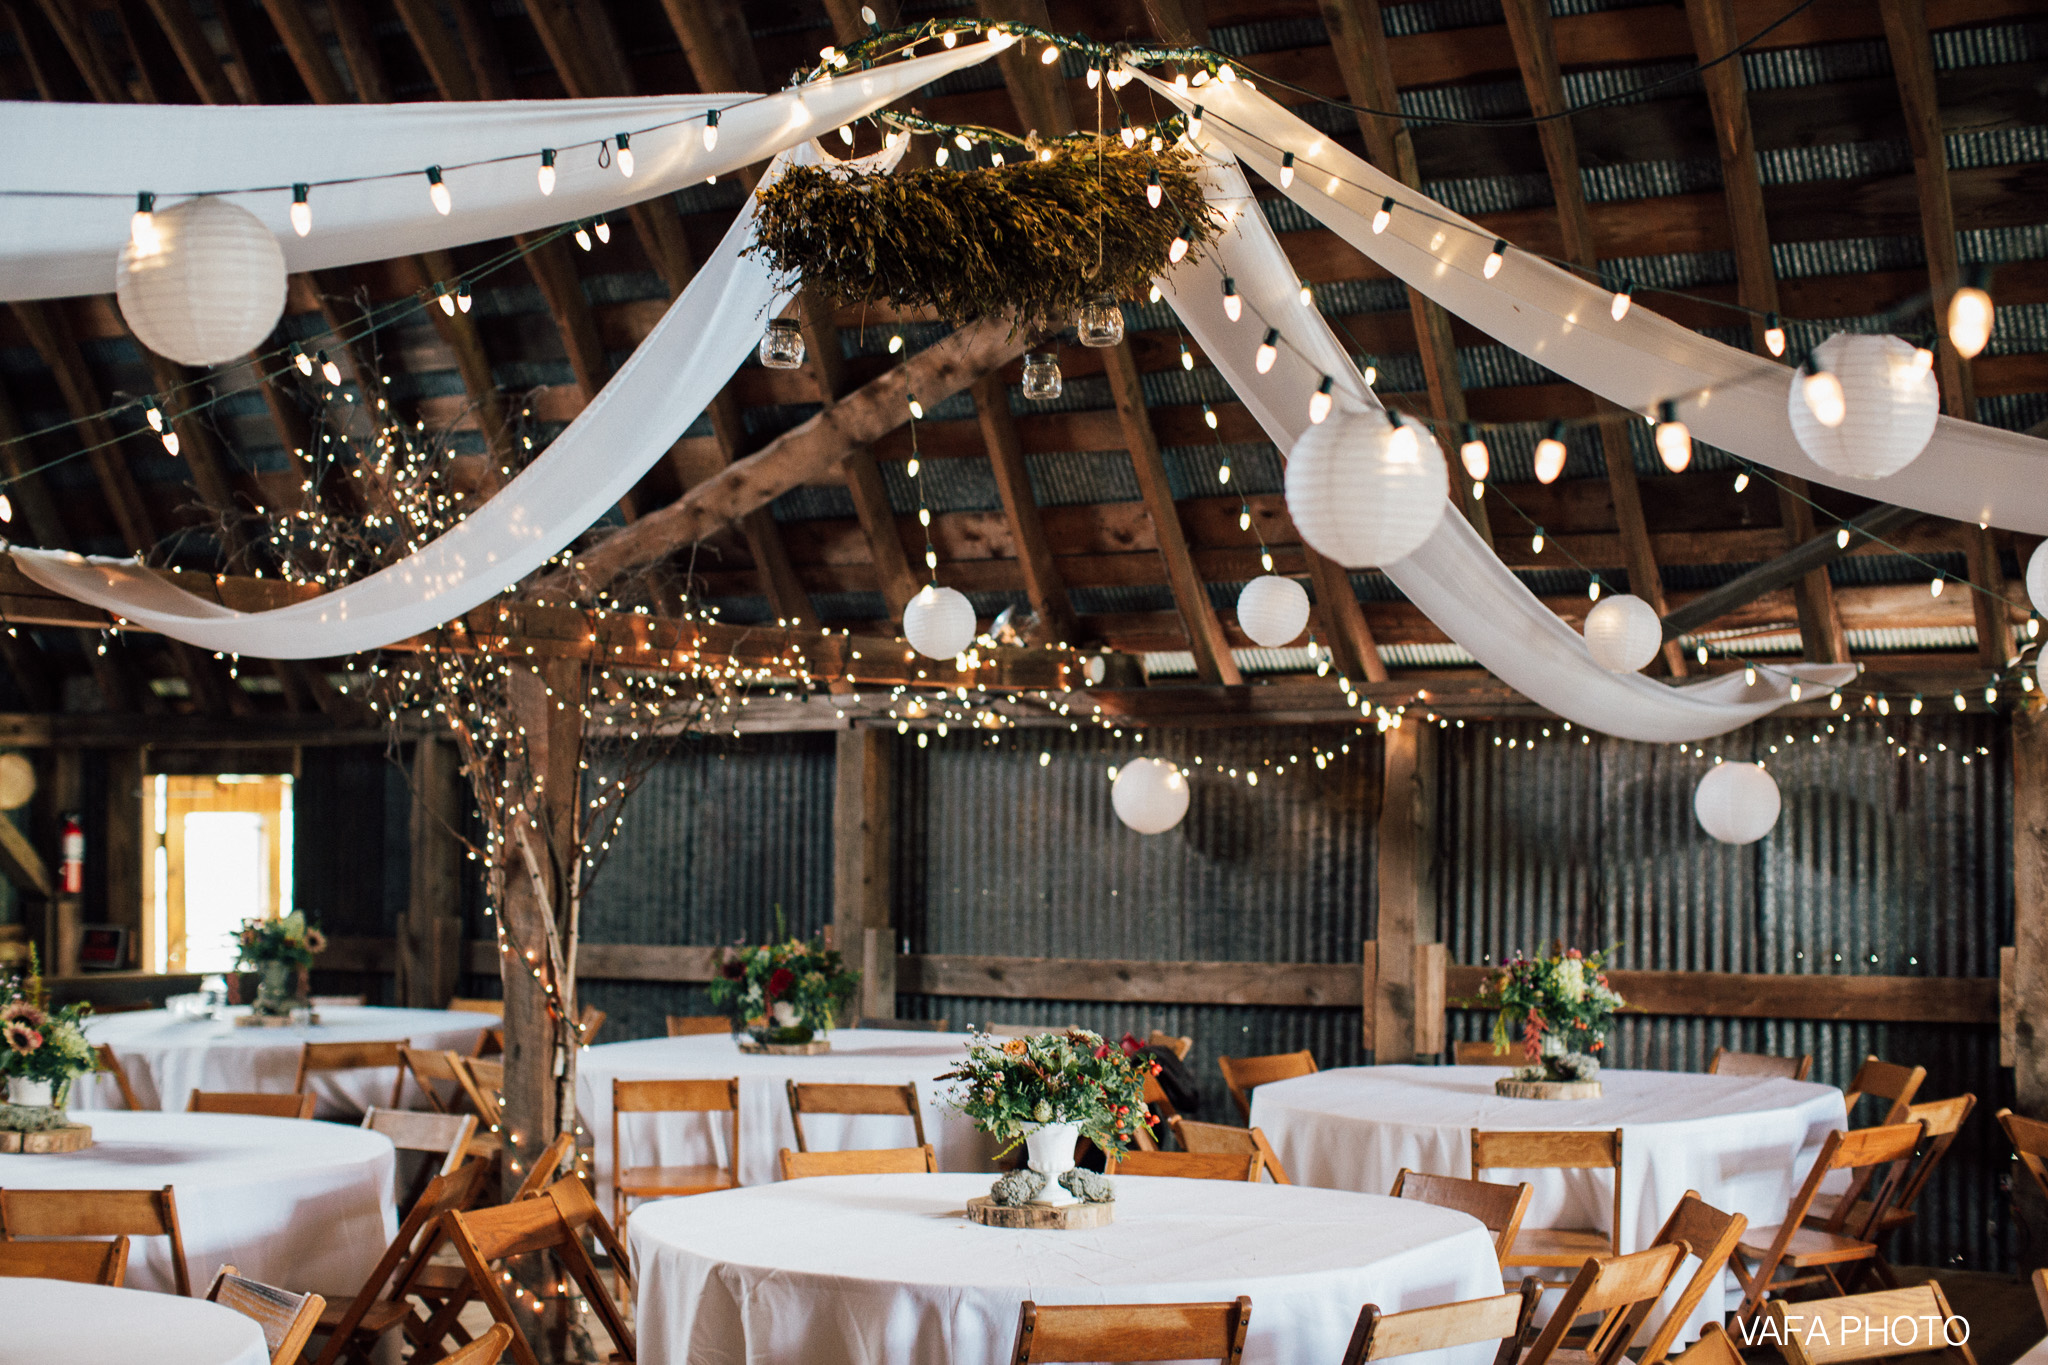 Belsolda-Farm-Wedding-Christy-Eric-Vafa-Photo-282.jpg